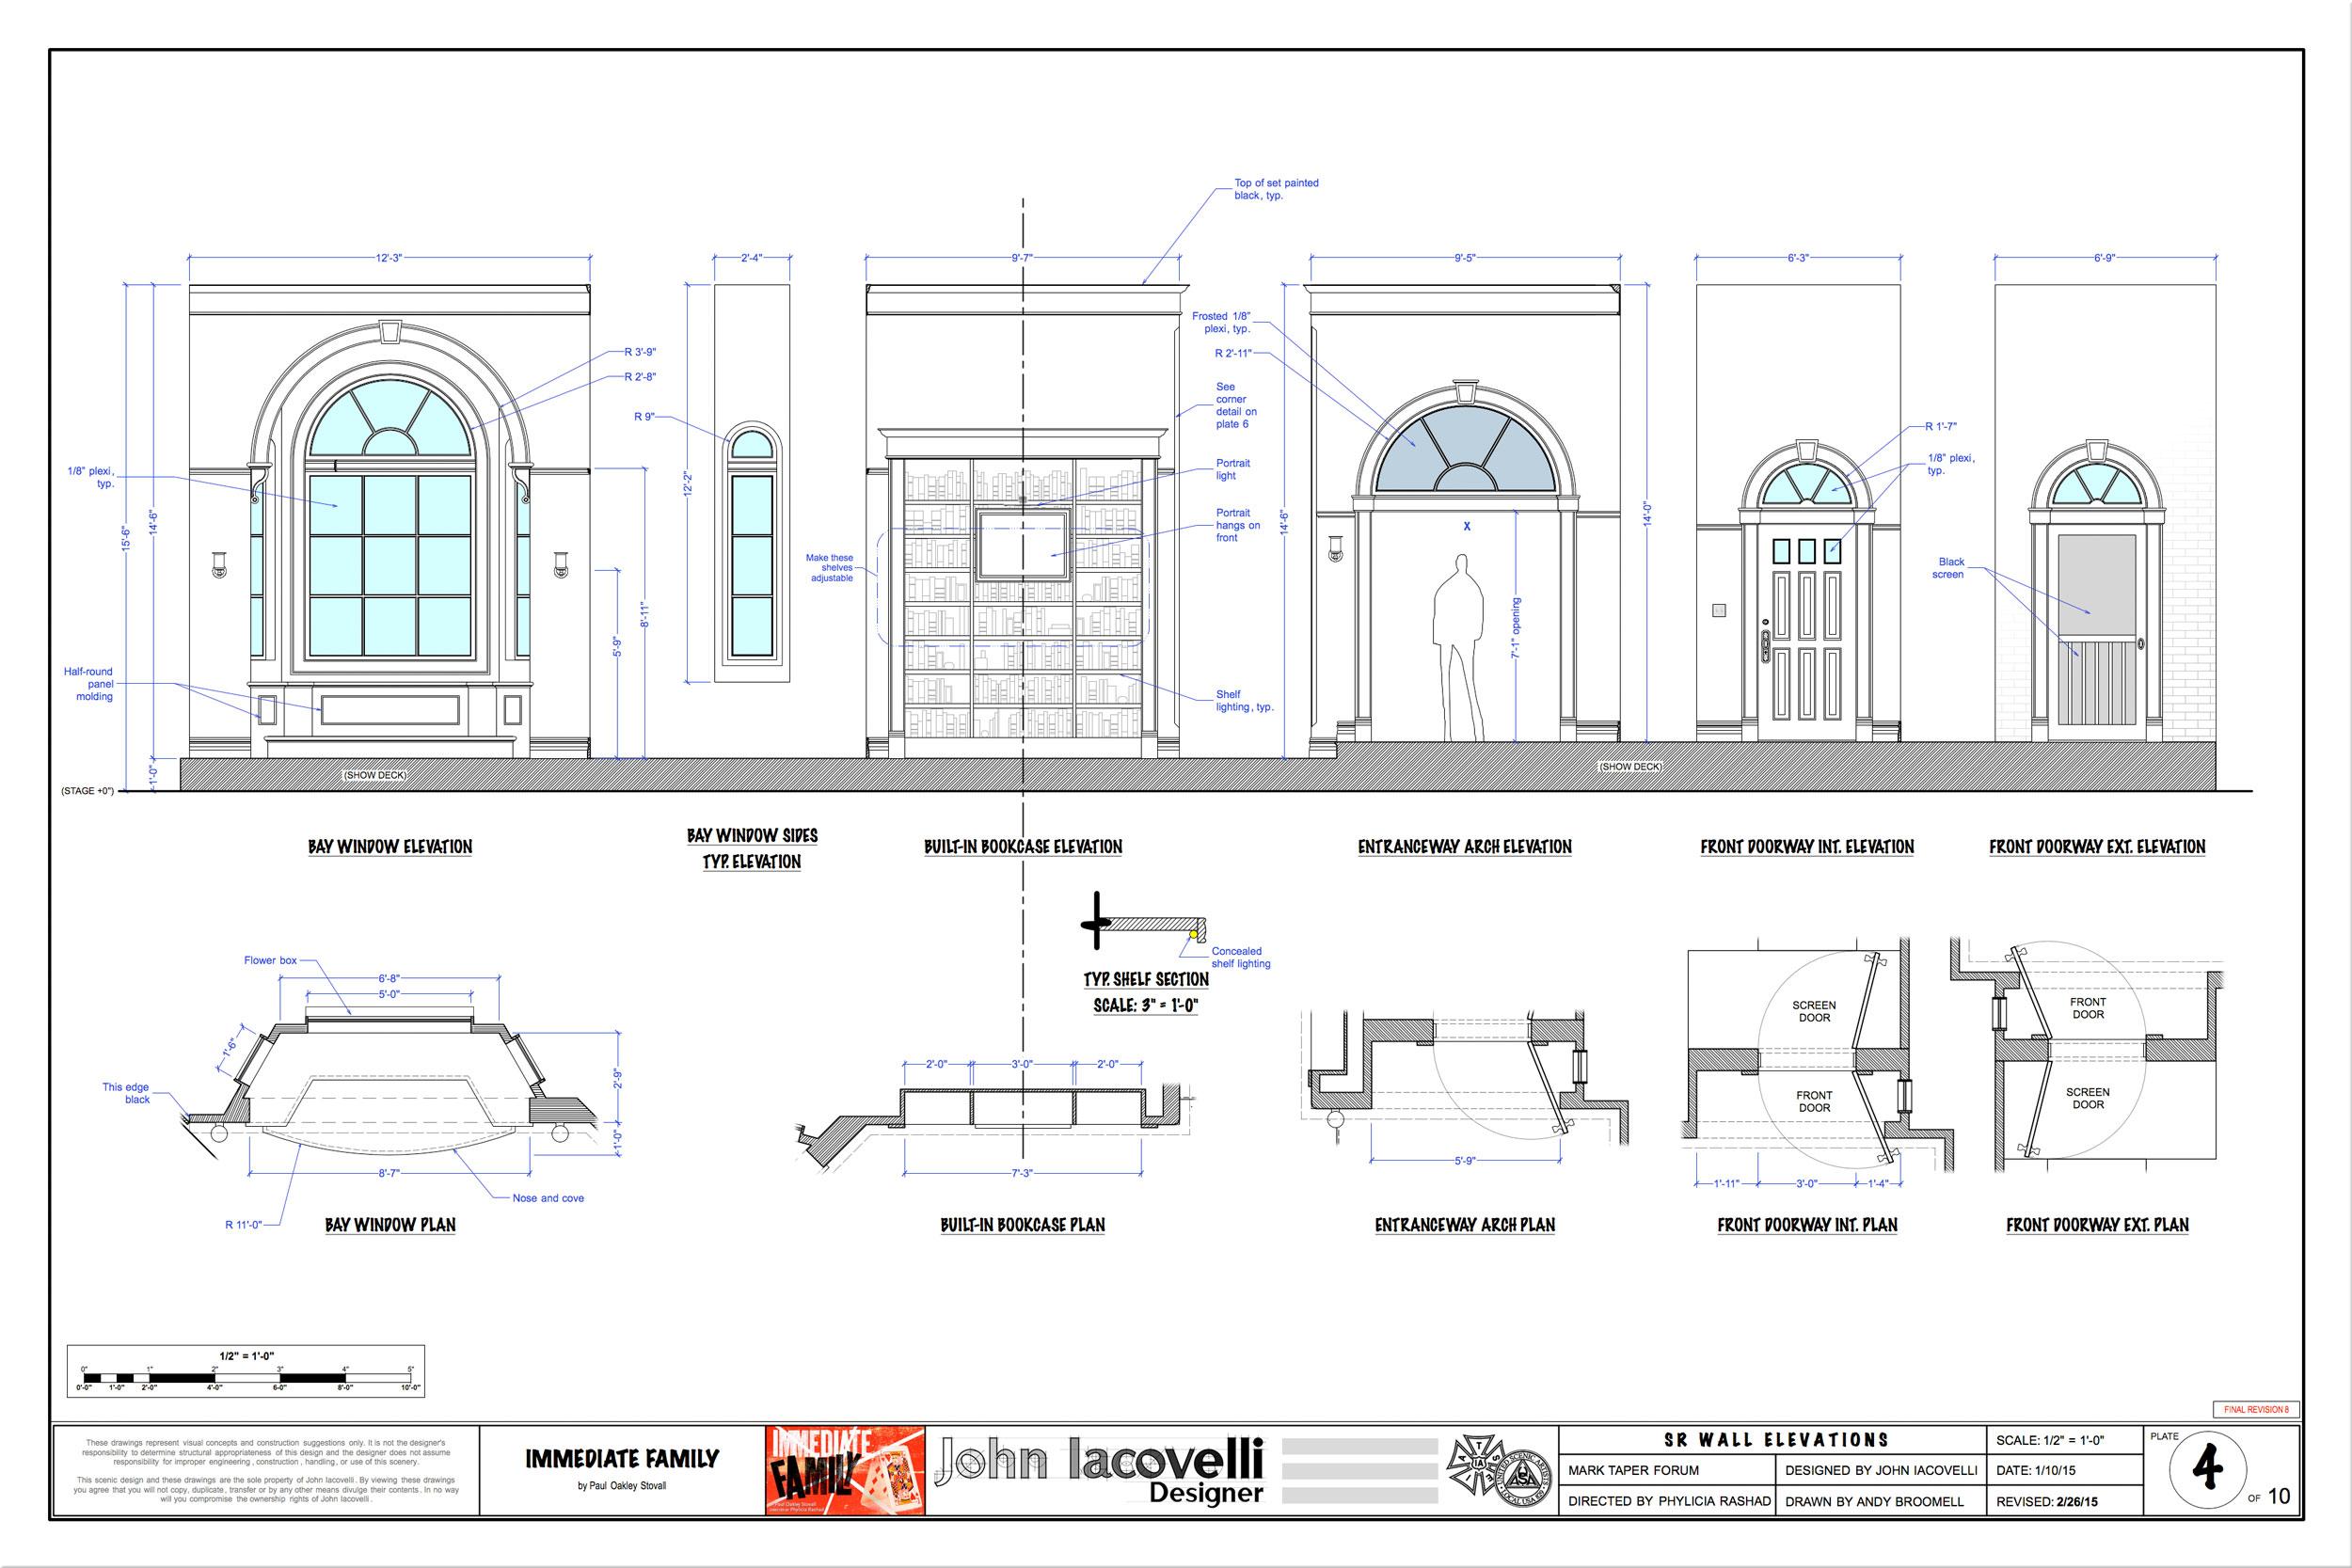 andy-broomell-scenic-design-drafting-immediate-family-4-vectorworks.jpg